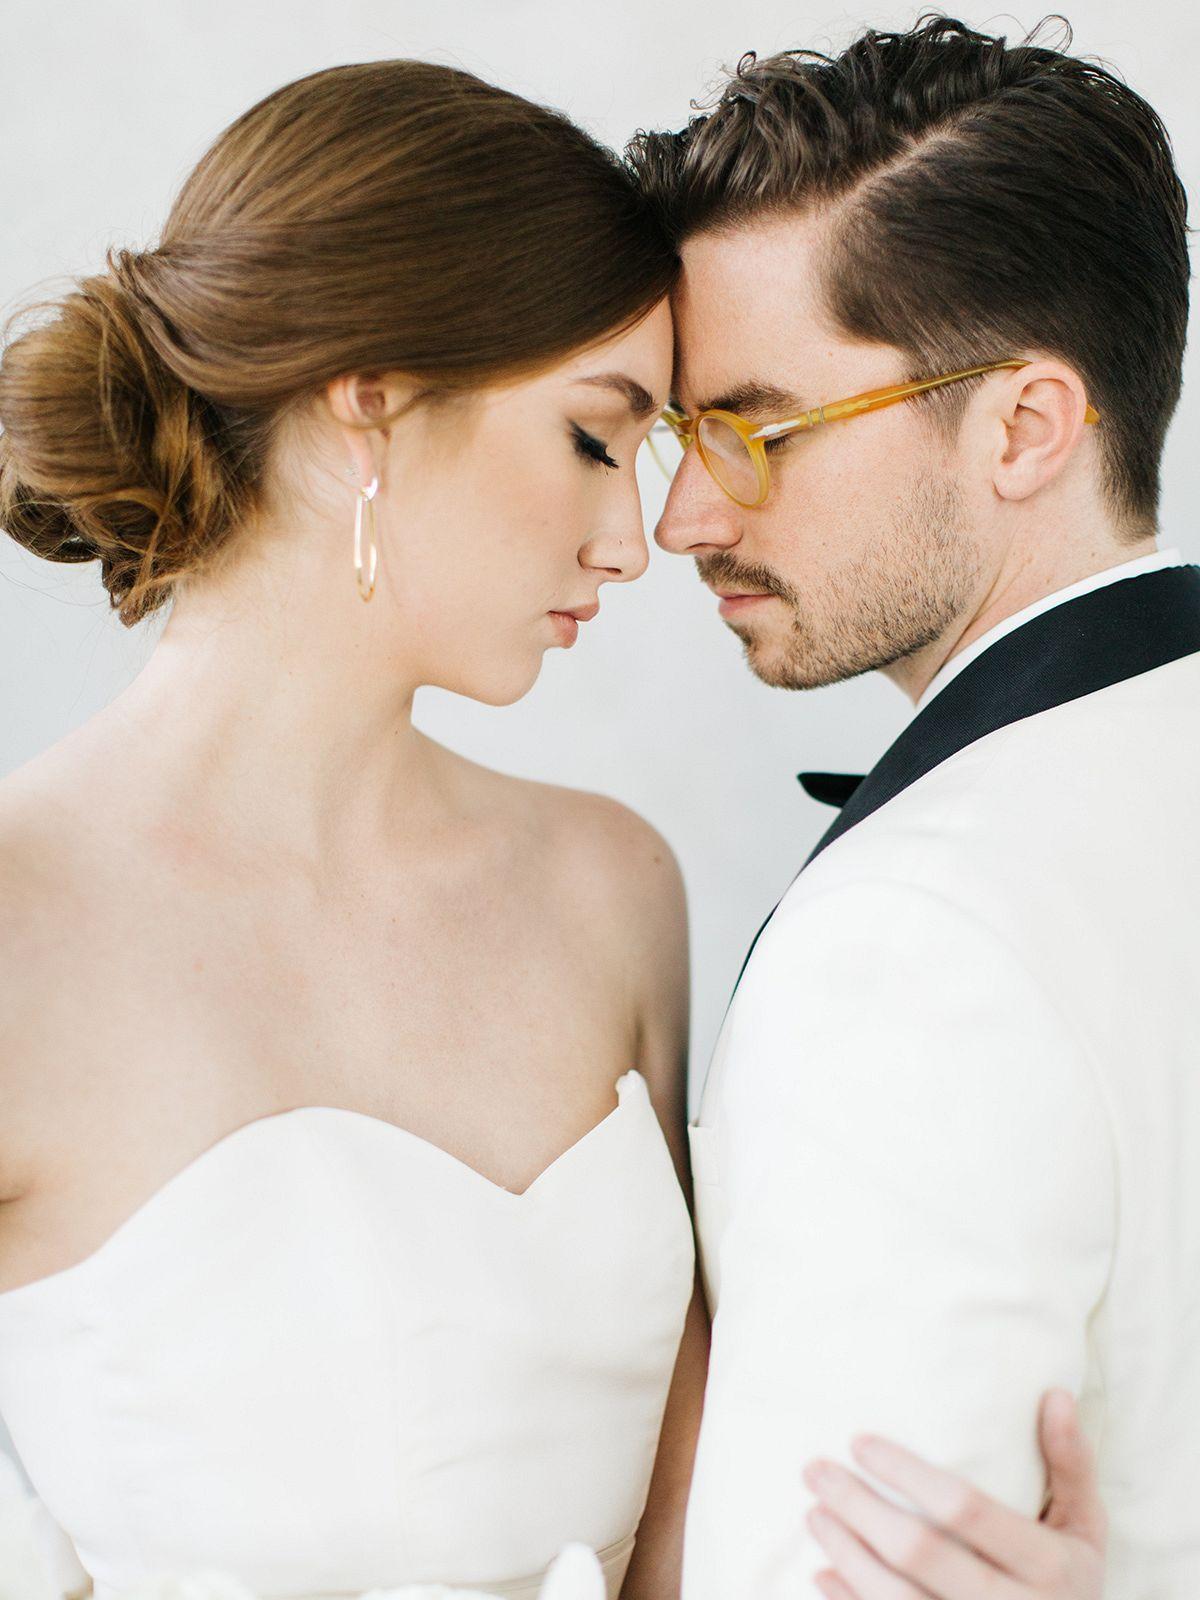 Modern And Feminine Indoor Wedding Couple Photography Ideas And Inspiration Couple Couplephoto Brid Modern Wedding Photography Wedding Couples Wedding Poses